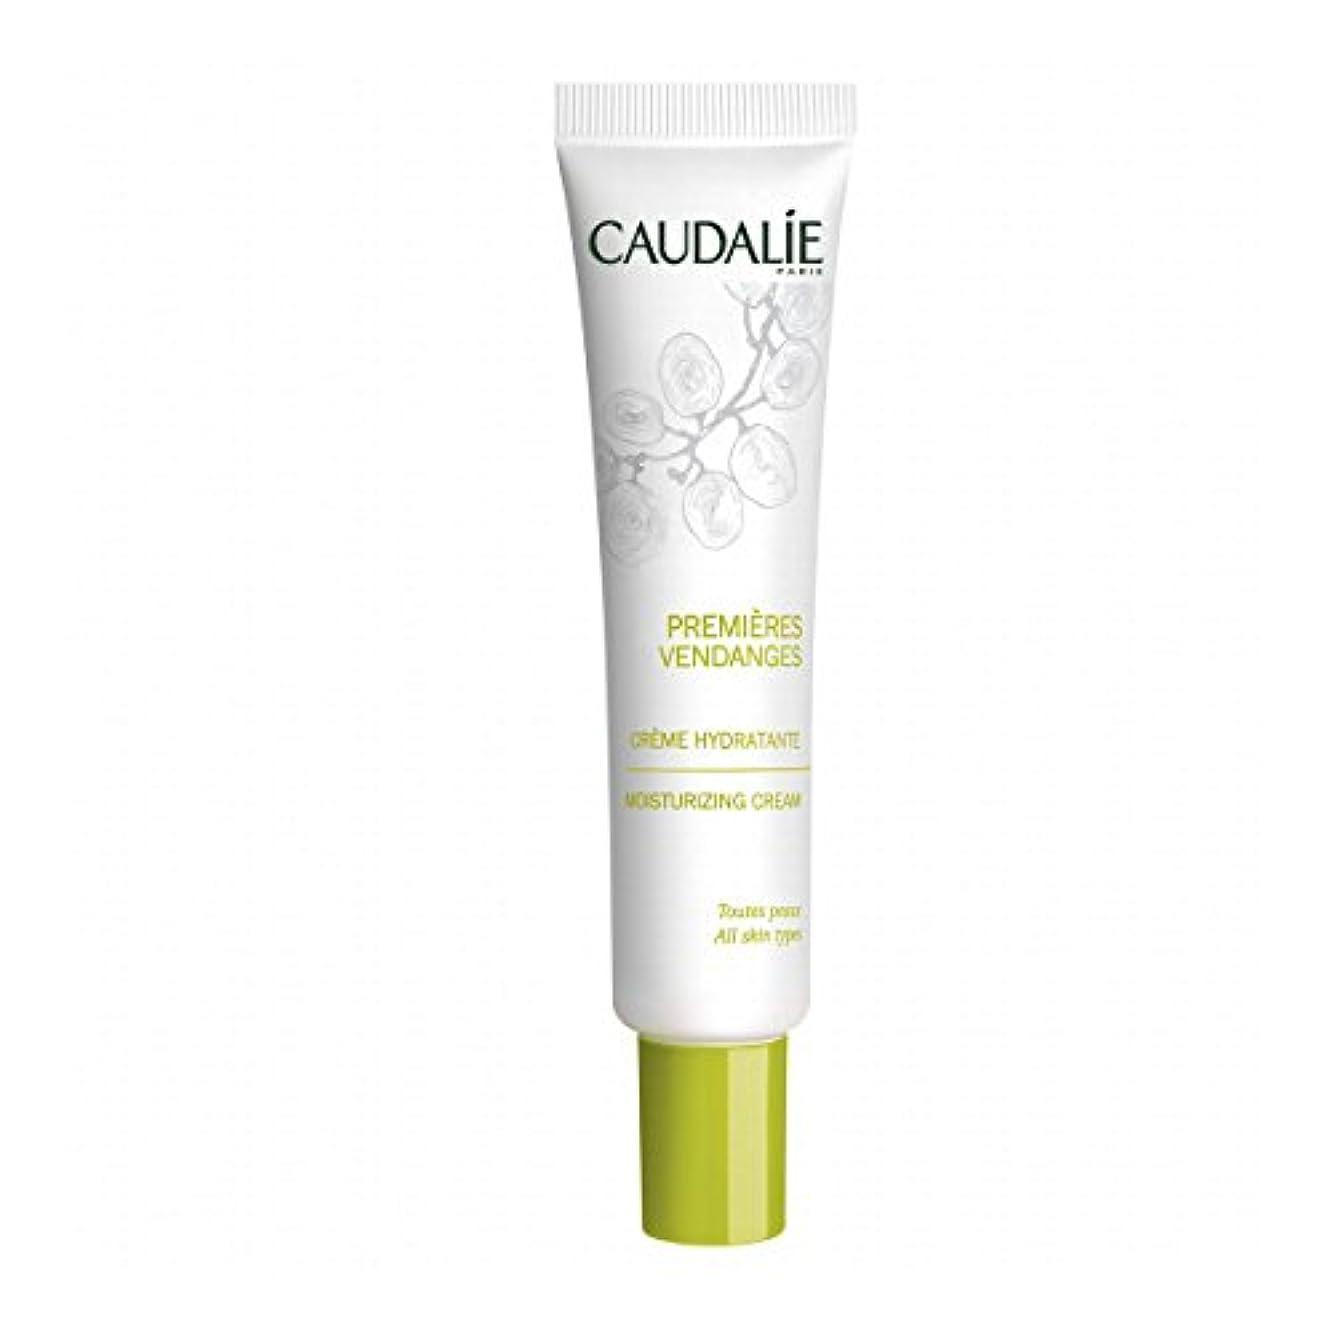 後世流星滑るCaudalie Premieres Vendanges Moisturizing Cream 40ml [並行輸入品]